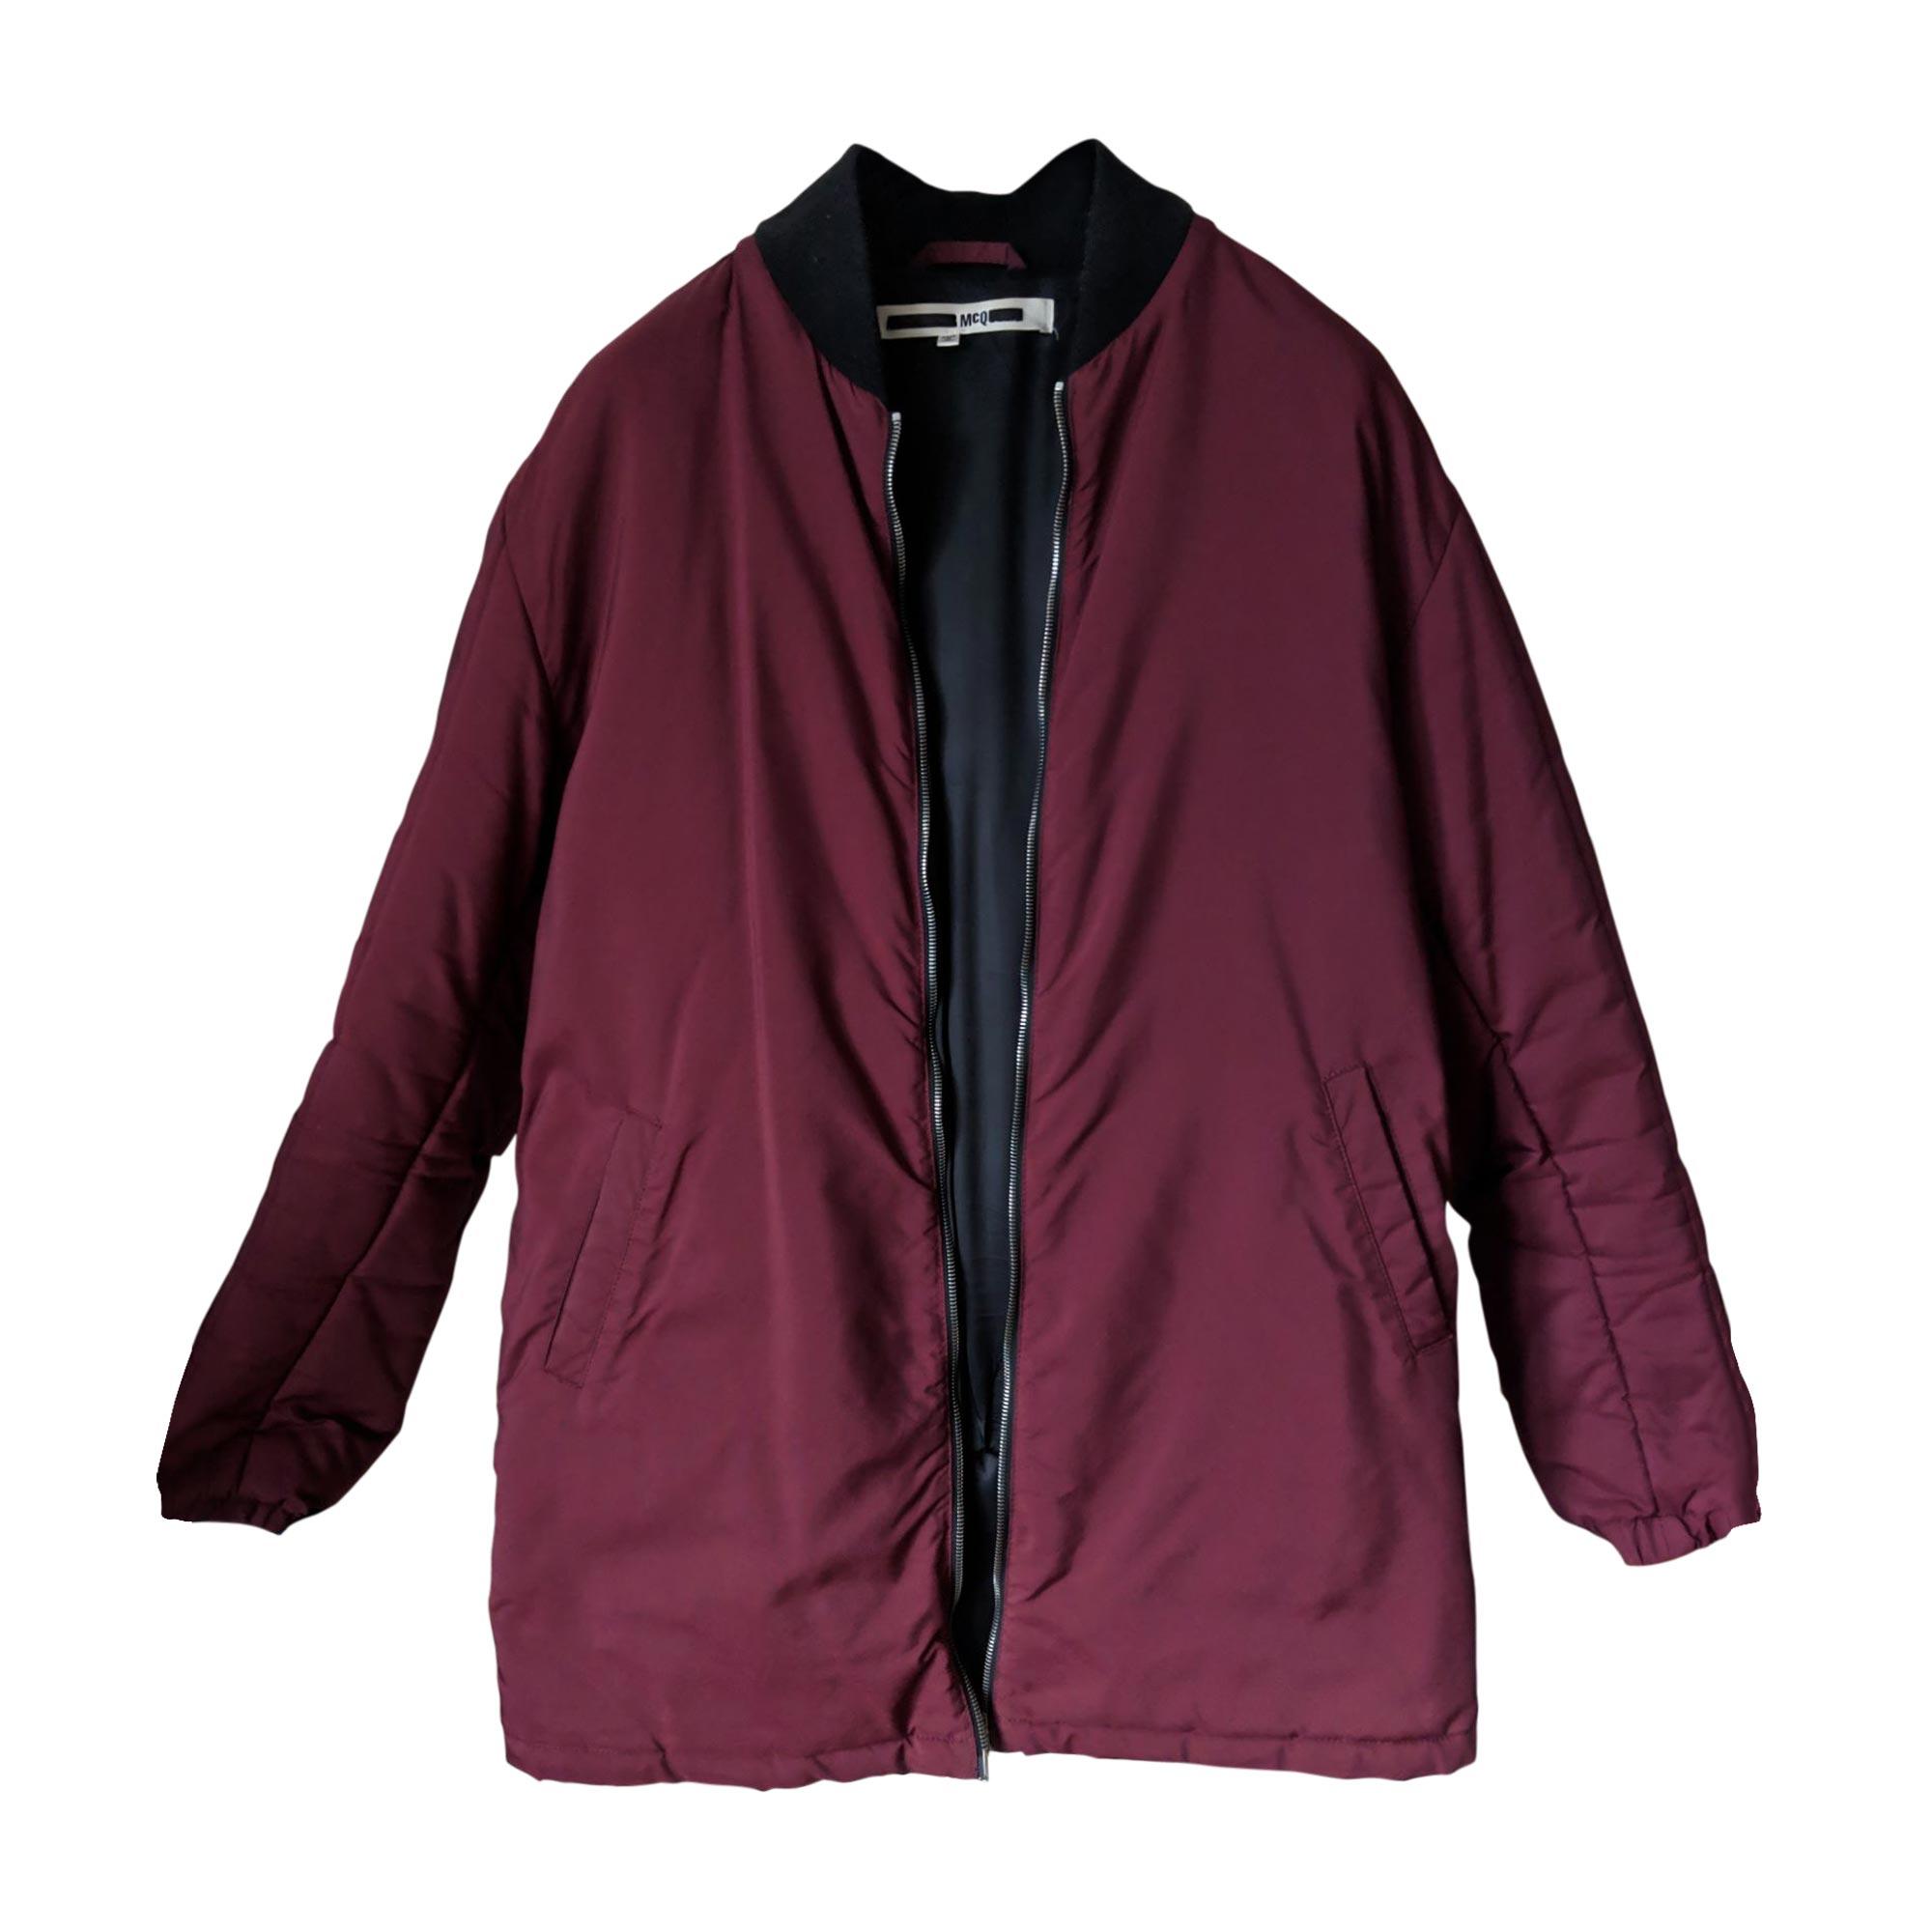 Zipped Jacket ALEXANDER MCQUEEN Red, burgundy